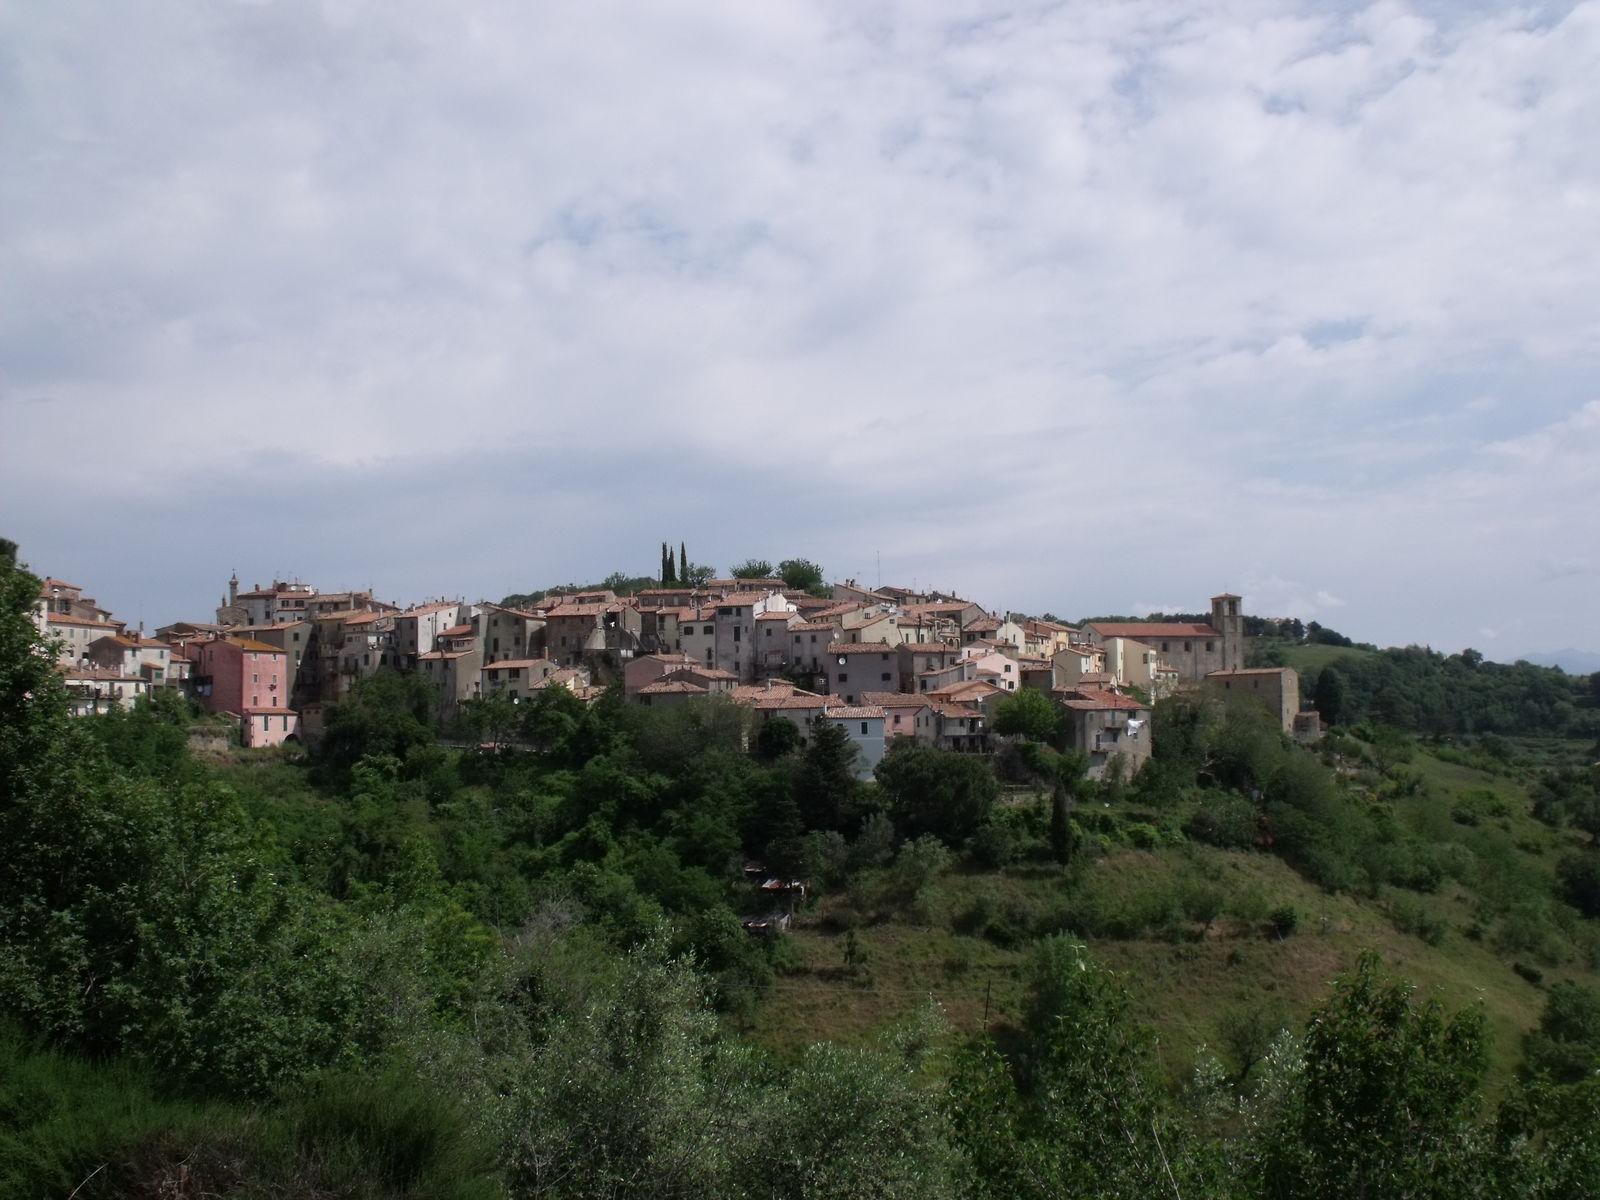 Scansano - Where Maremma wine is born